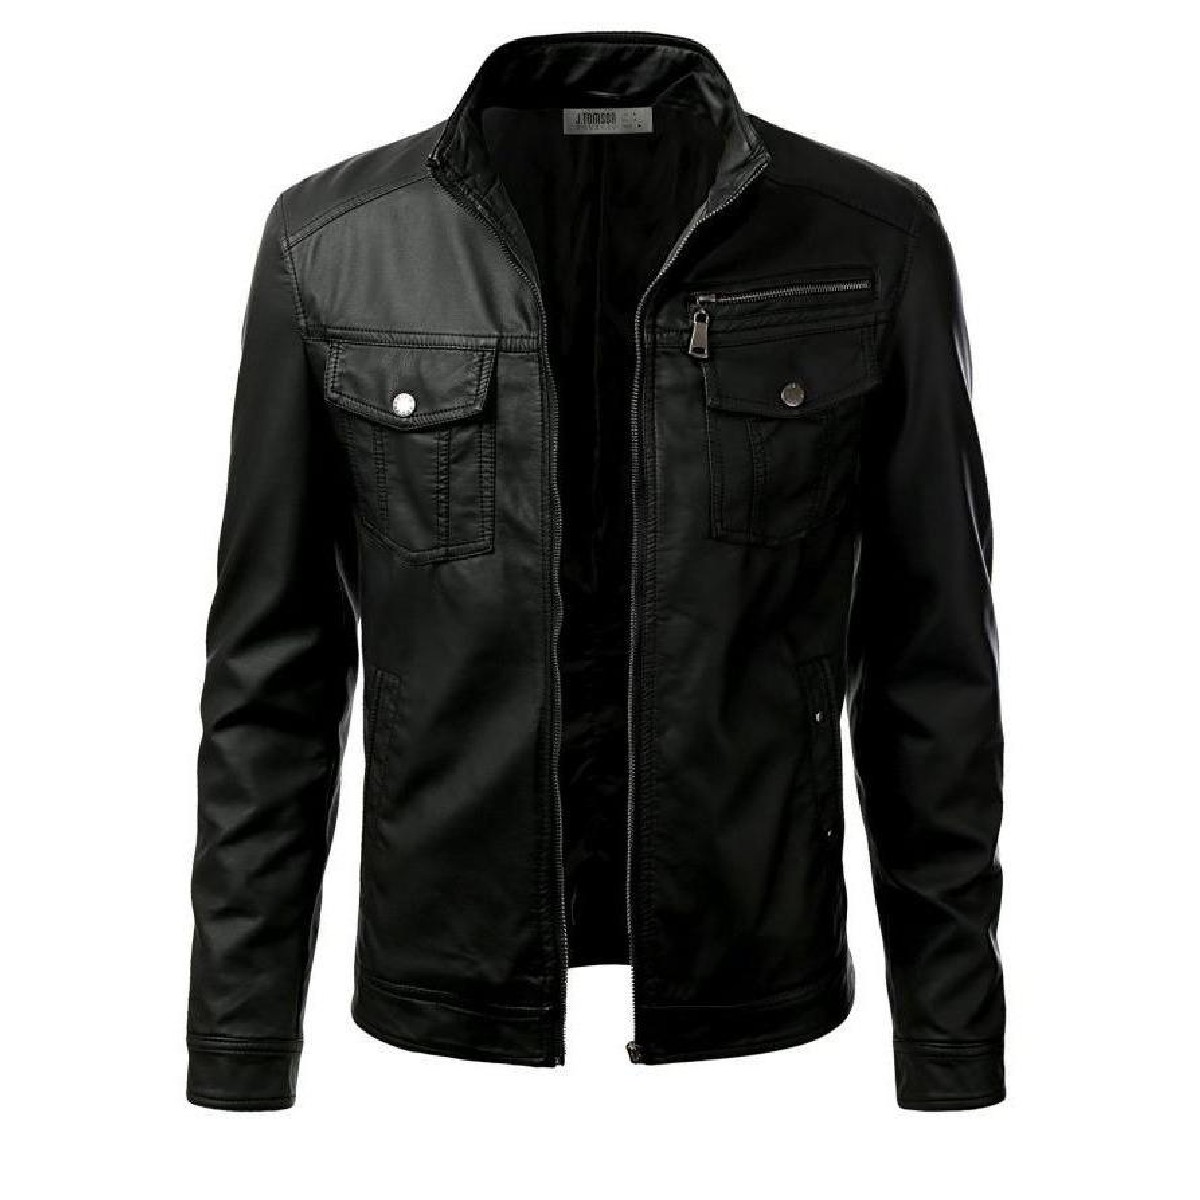 Shop Mart Black Faux Leather Jacket For Men